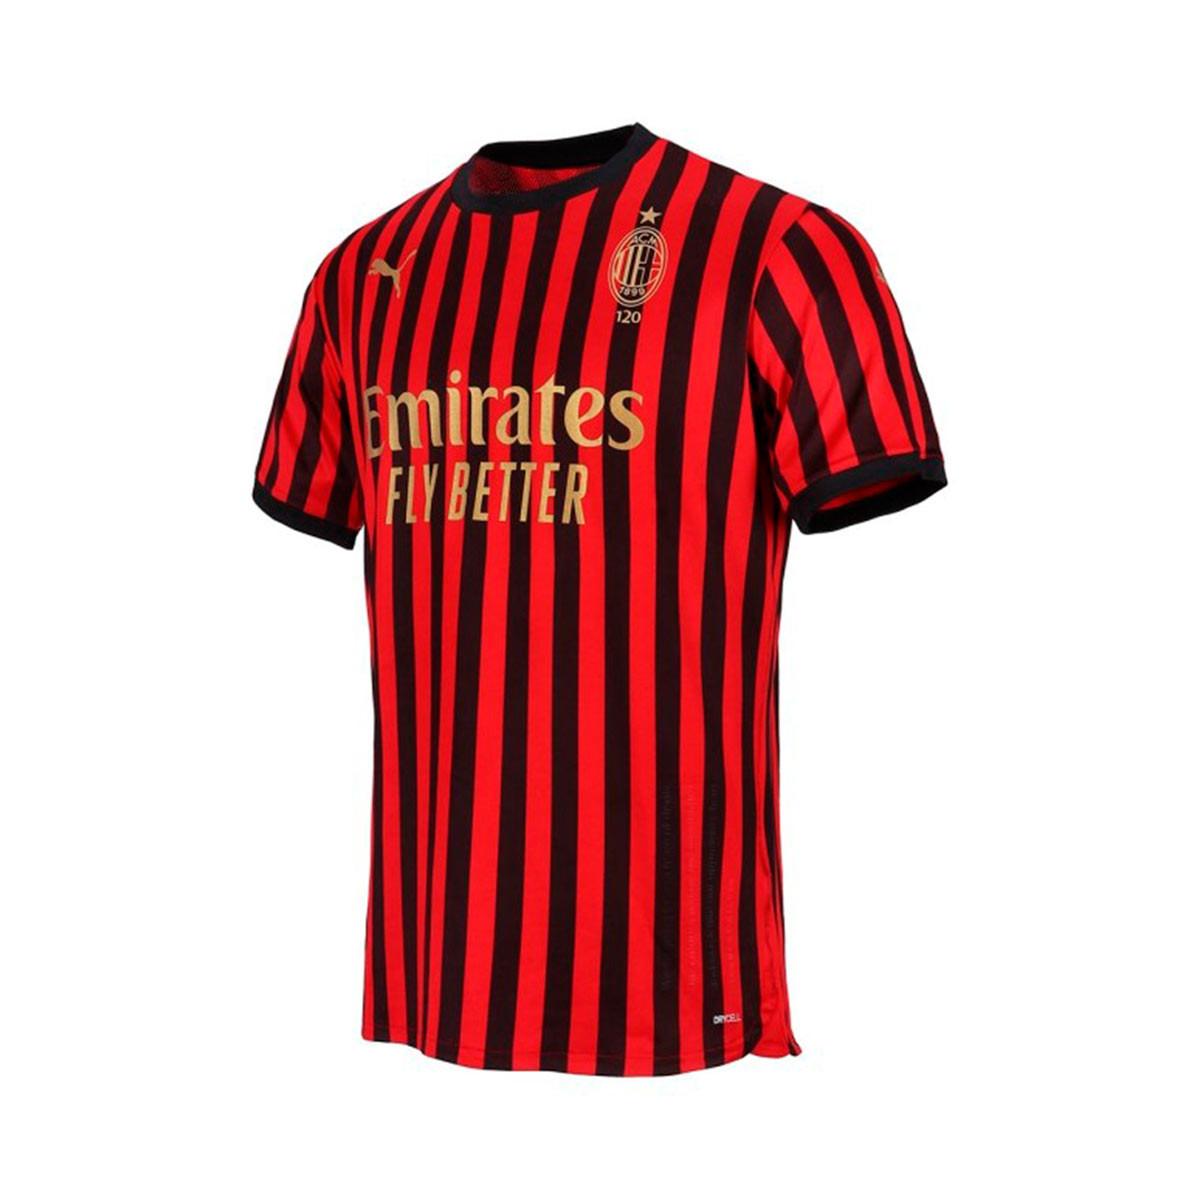 Jersey Puma Ac Milan Home Shirt Authentic 120 Years Tango Red Puma Black Football Store Futbol Emotion